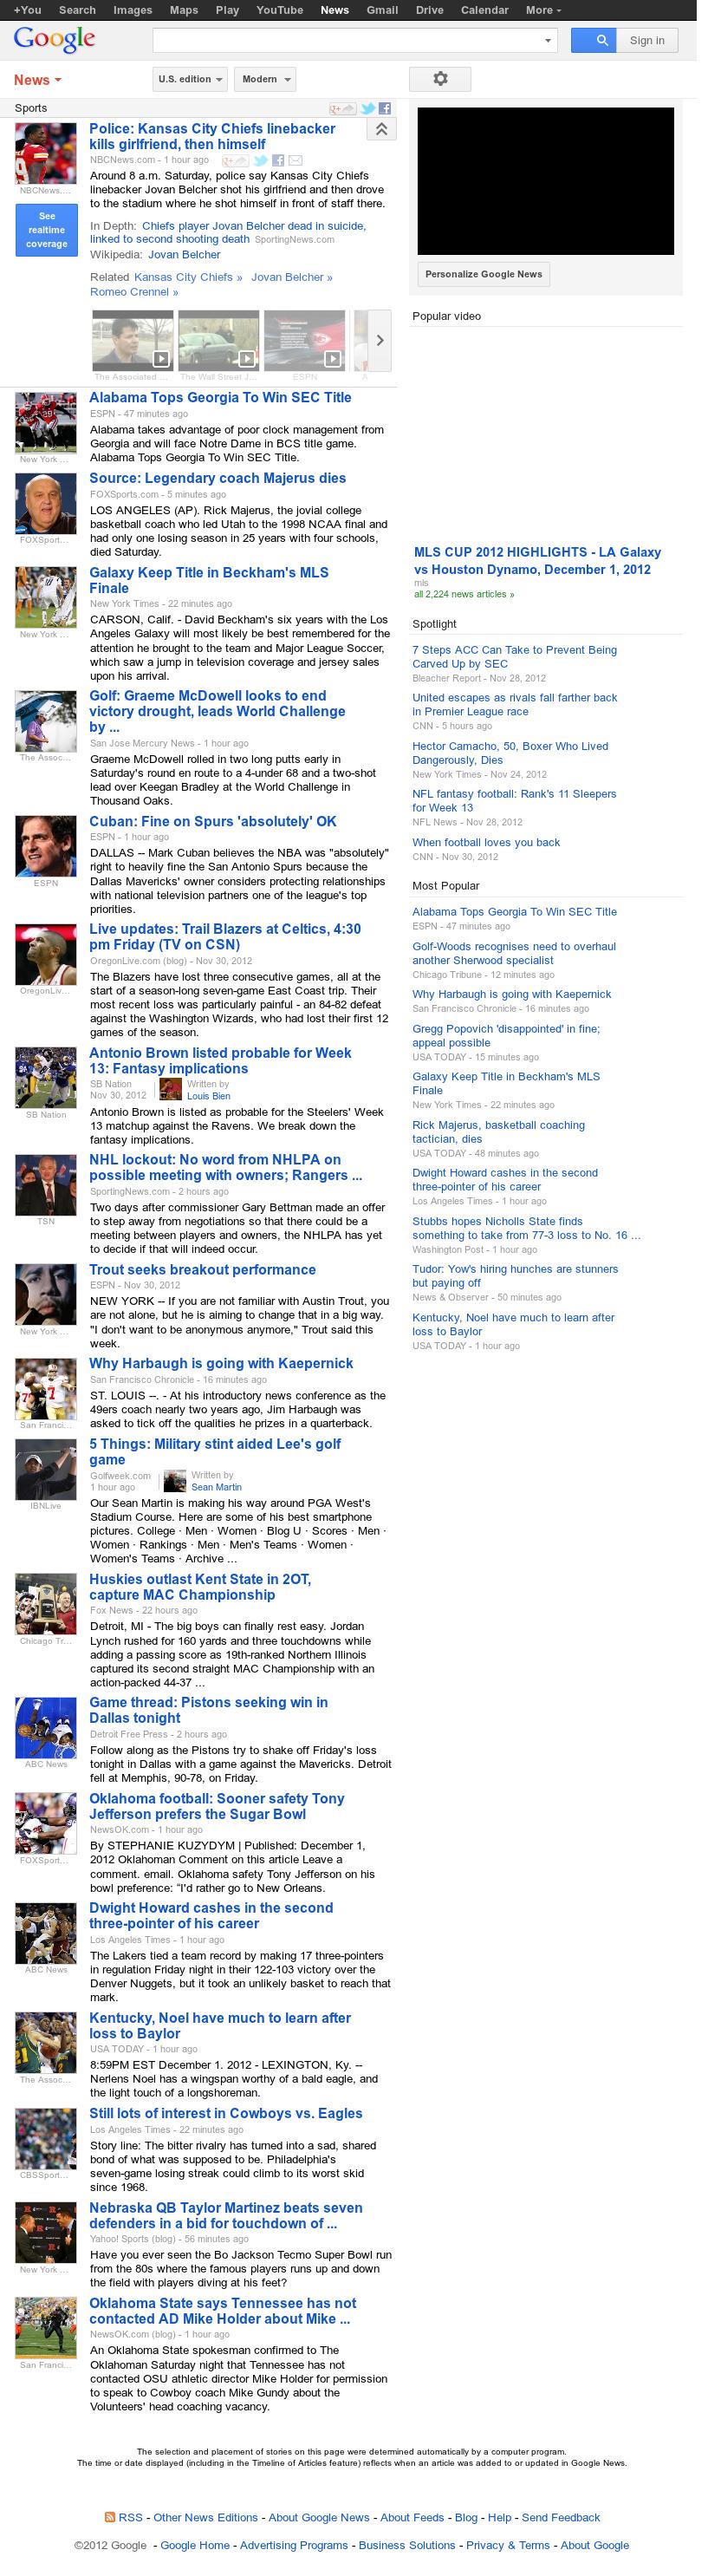 Google News: Sports at Sunday Dec. 2, 2012, 3:11 a.m. UTC